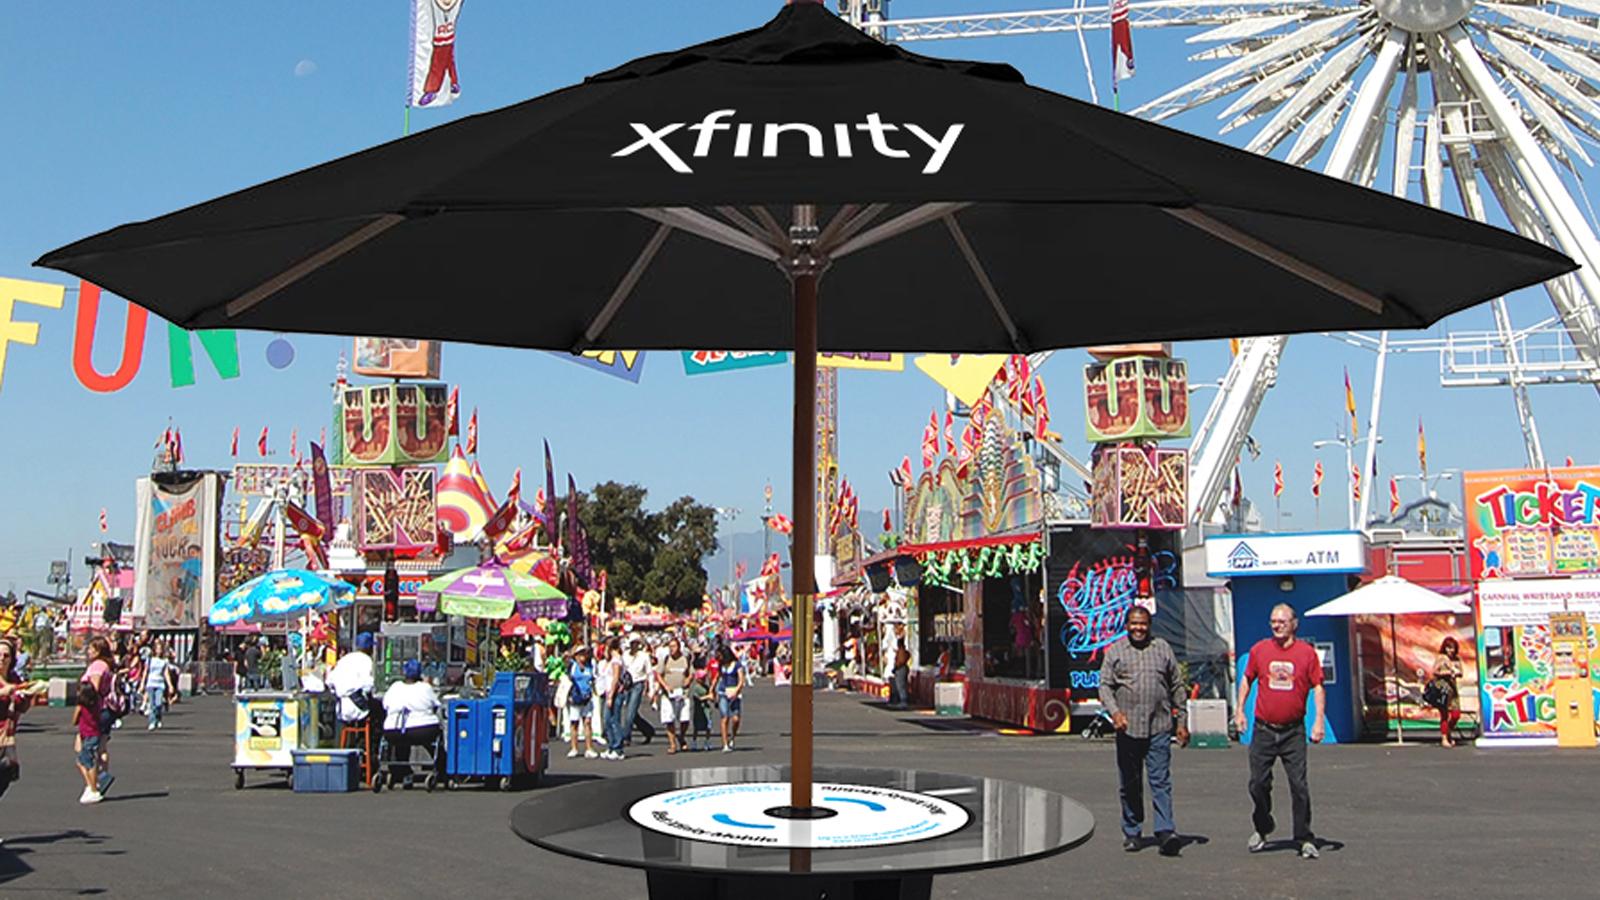 A large sun umbrella displaying the Xfinity logo.